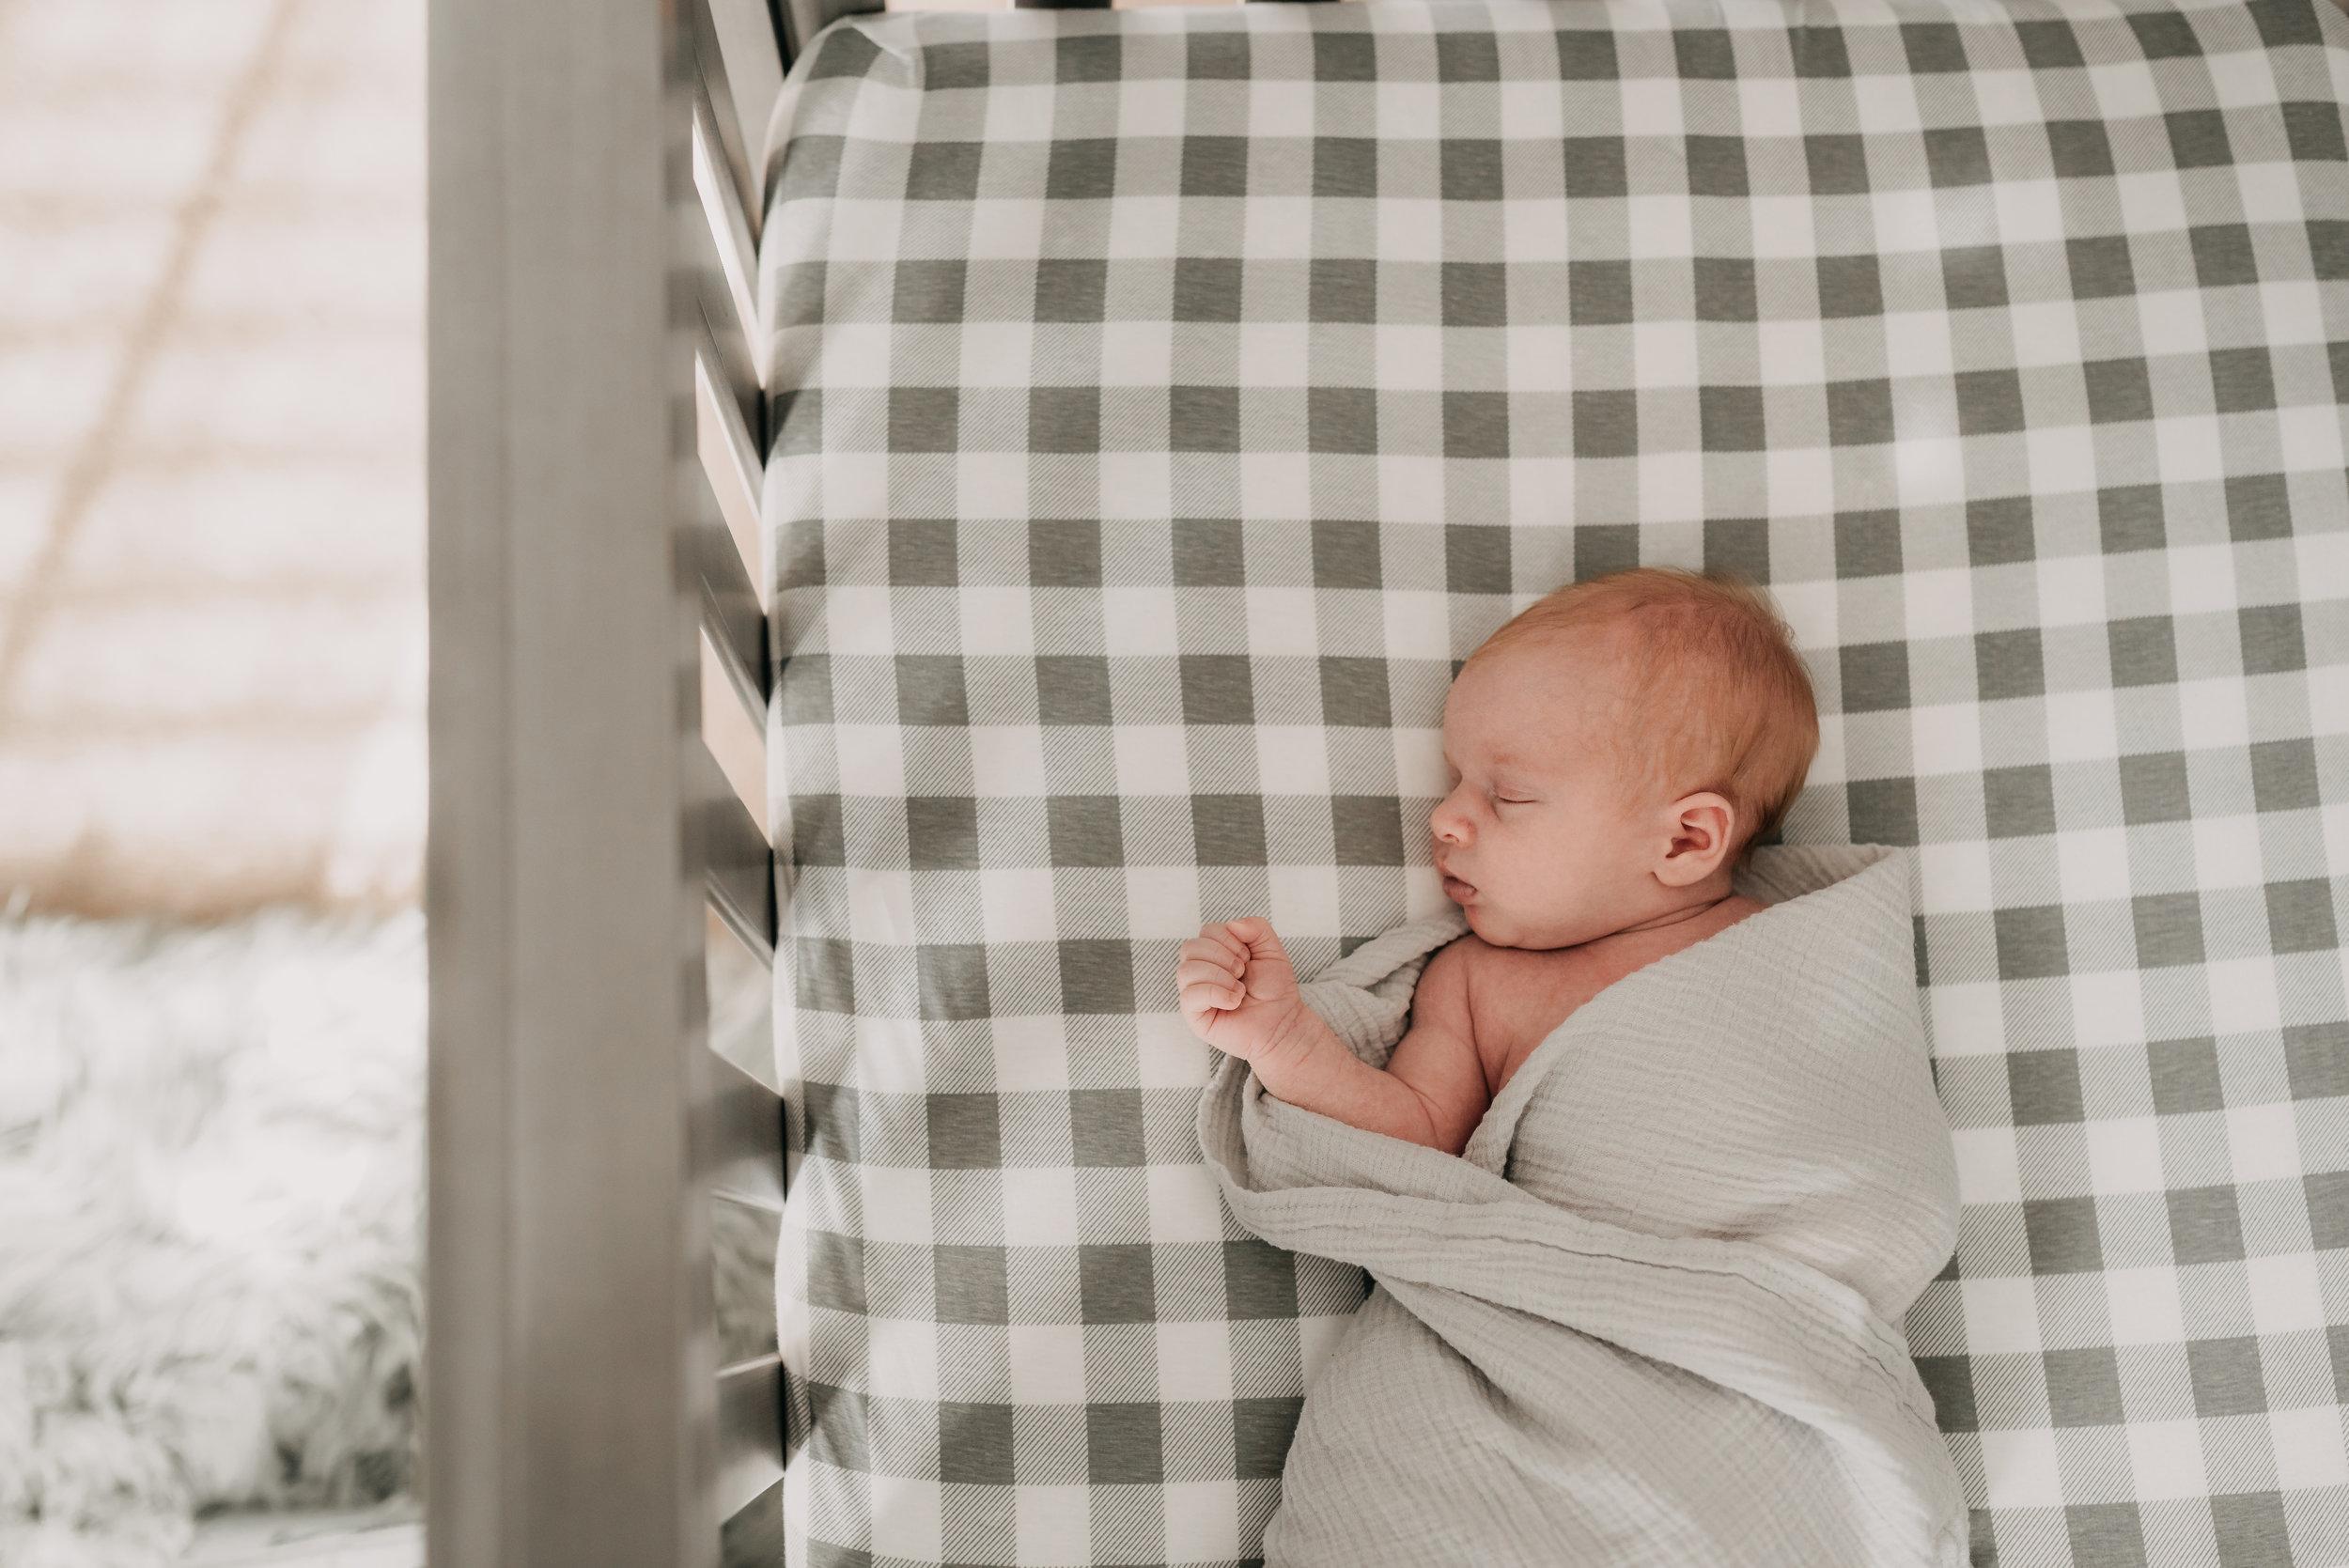 Newborn Photographer, Baby, Family session, Hamilton and Niagara Family Photographer, Grimsby, Beamsville, Lincoln